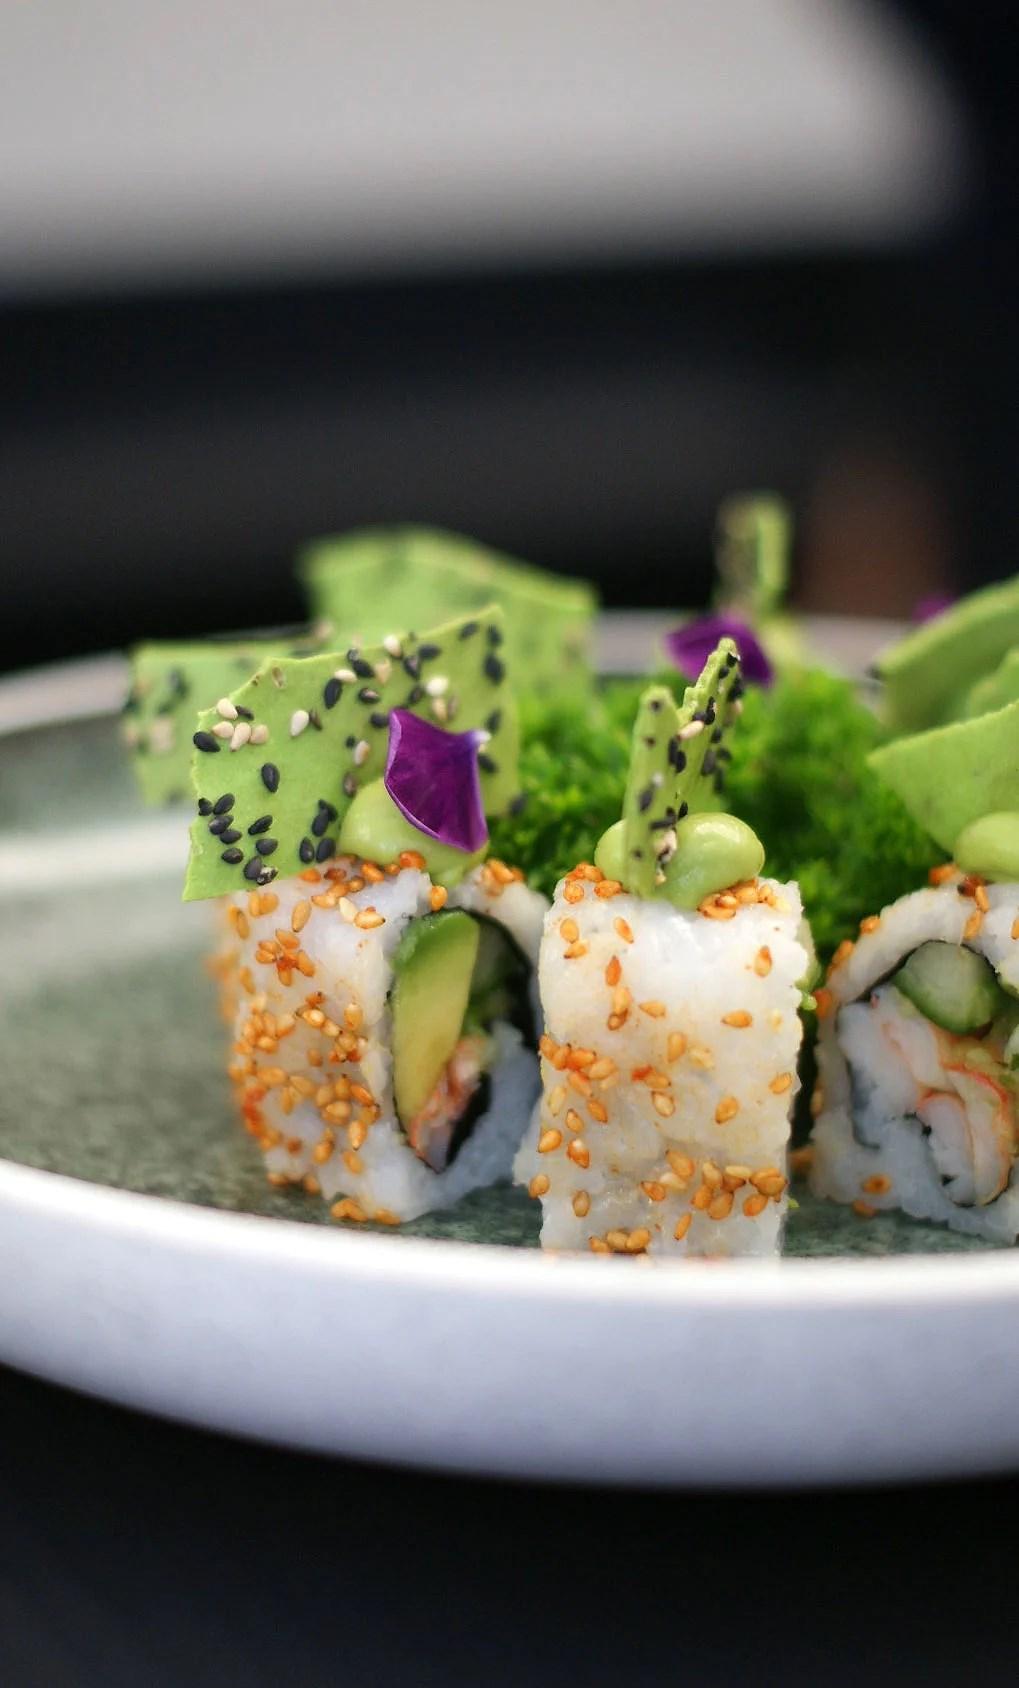 Sushievent, Xoxo sushi aalborg, Aalborg sushi, Julie Mænnchen, Blogger, Aalborg blogger, Aalborg blog, Asight event, God sushi Aalborg, Ekstraordinær sushi aalborg, sushi sushi